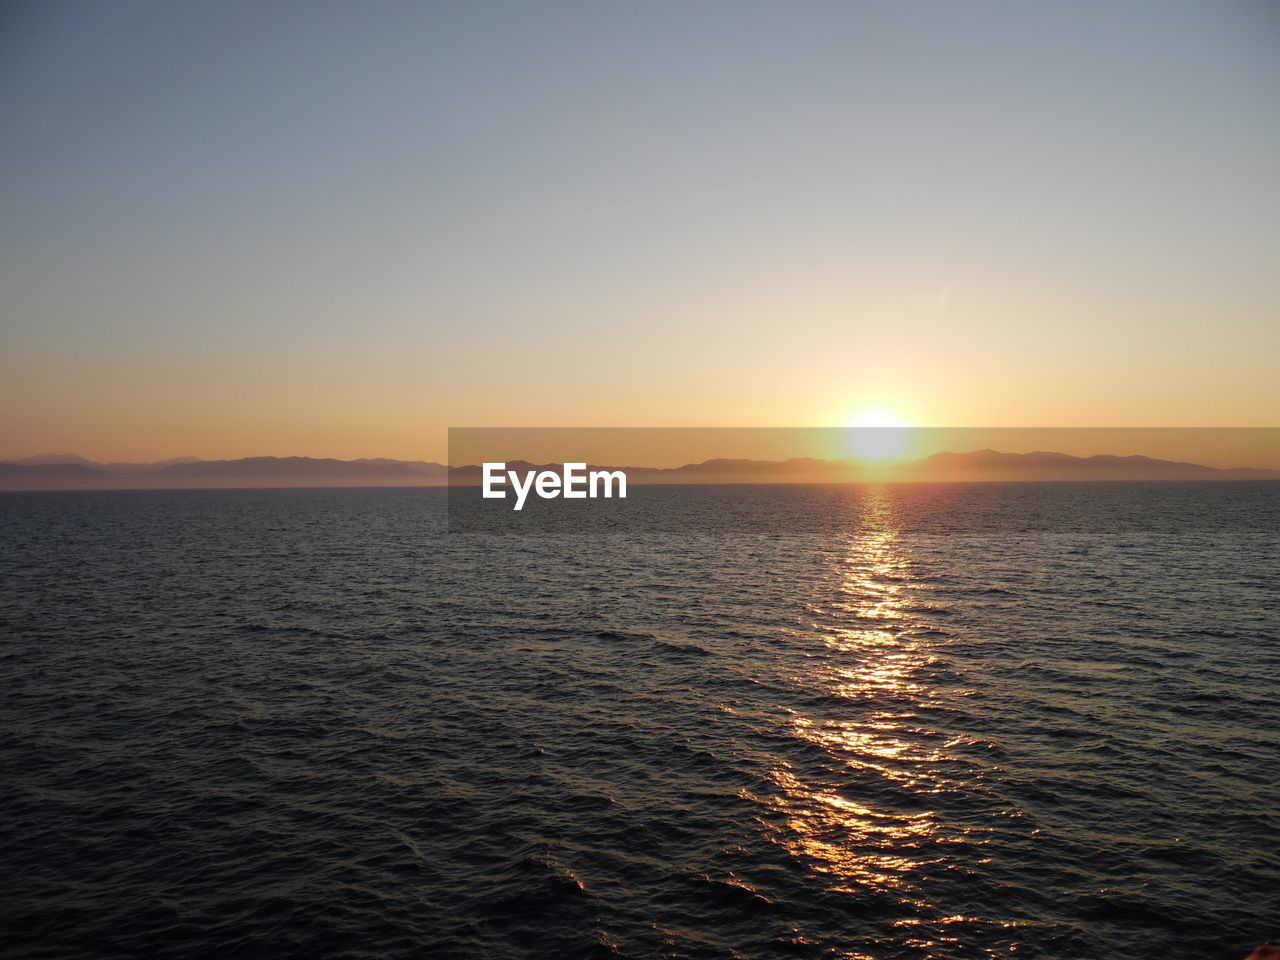 sky, sunset, water, sea, beauty in nature, scenics - nature, tranquility, waterfront, tranquil scene, sun, idyllic, nature, sunlight, orange color, horizon, non-urban scene, no people, remote, outdoors, horizon over water